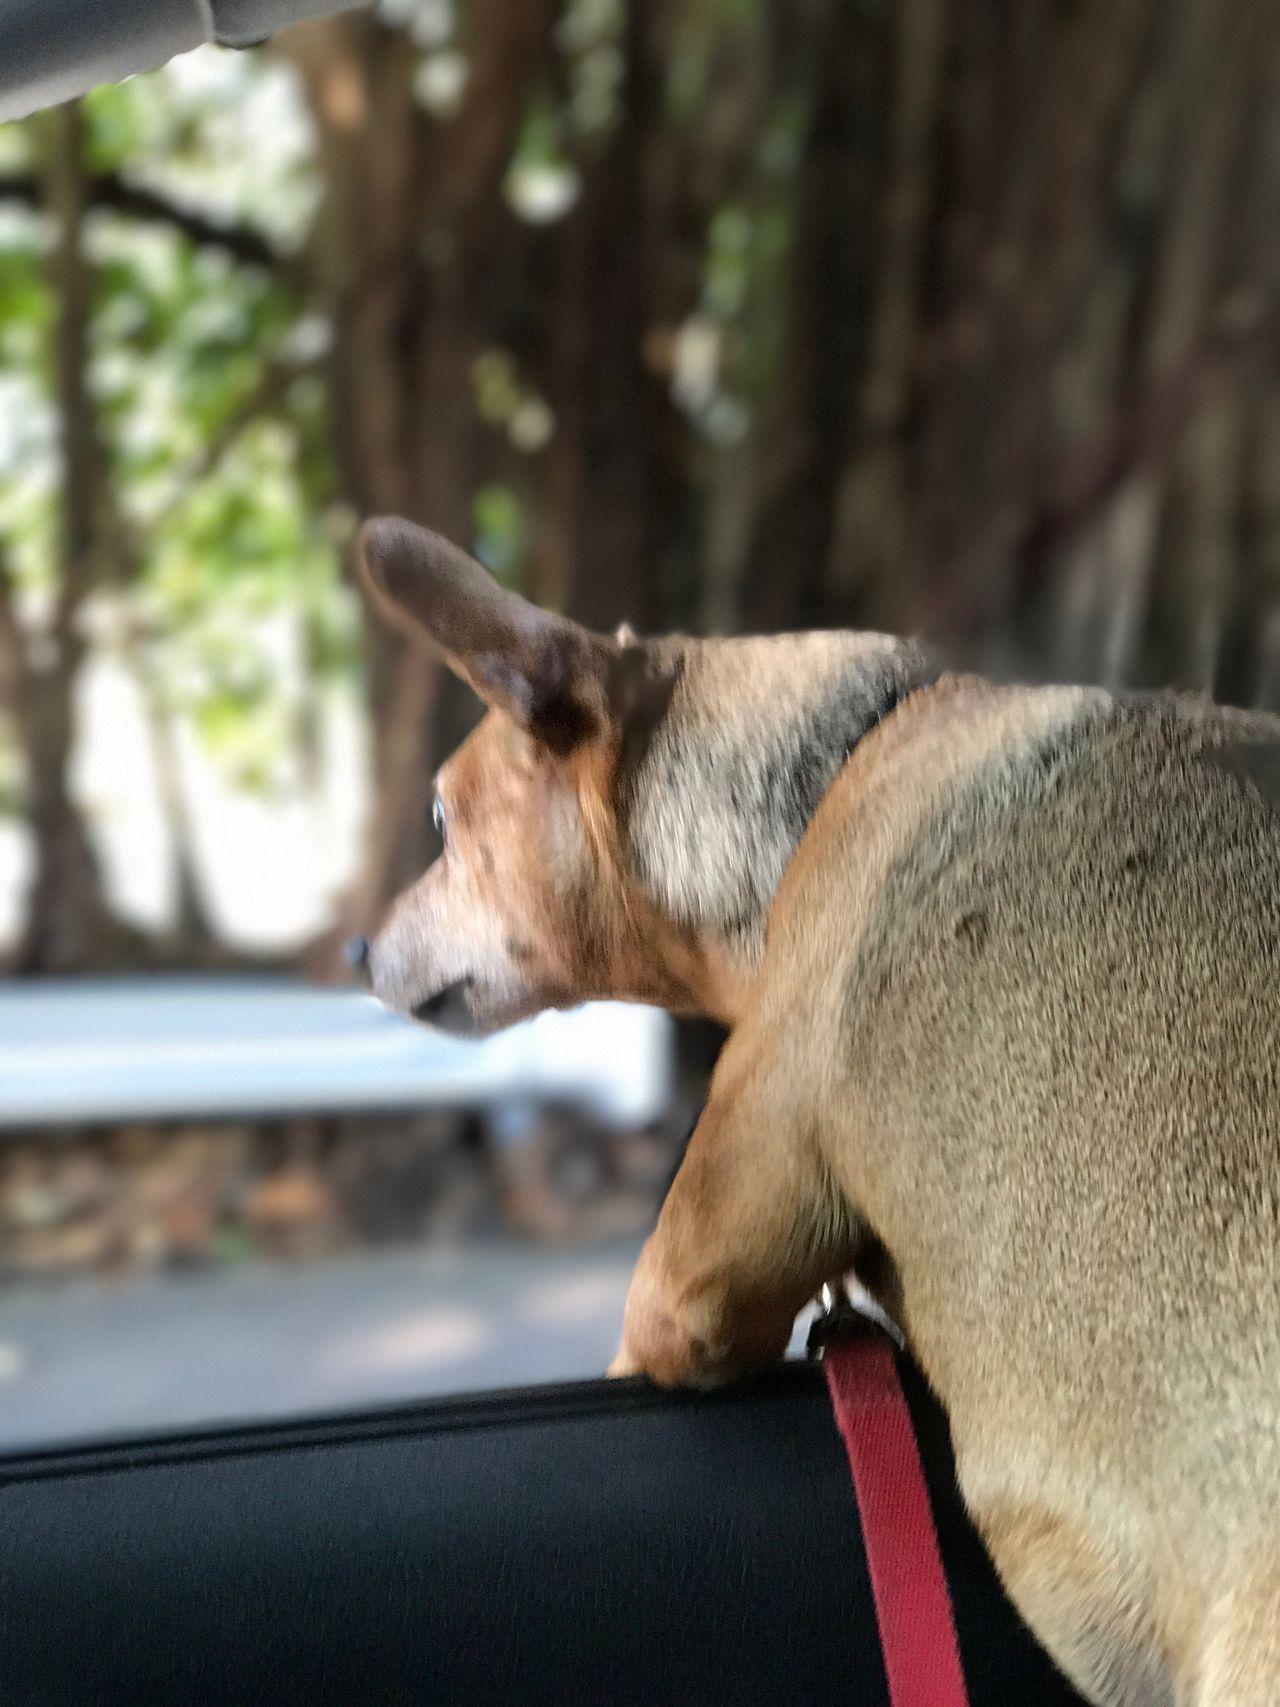 Curious One Animal Animal Themes Outdoors Doggy Love Eyeemdoglover PortraitPhotography portraitofadog Goingforaride